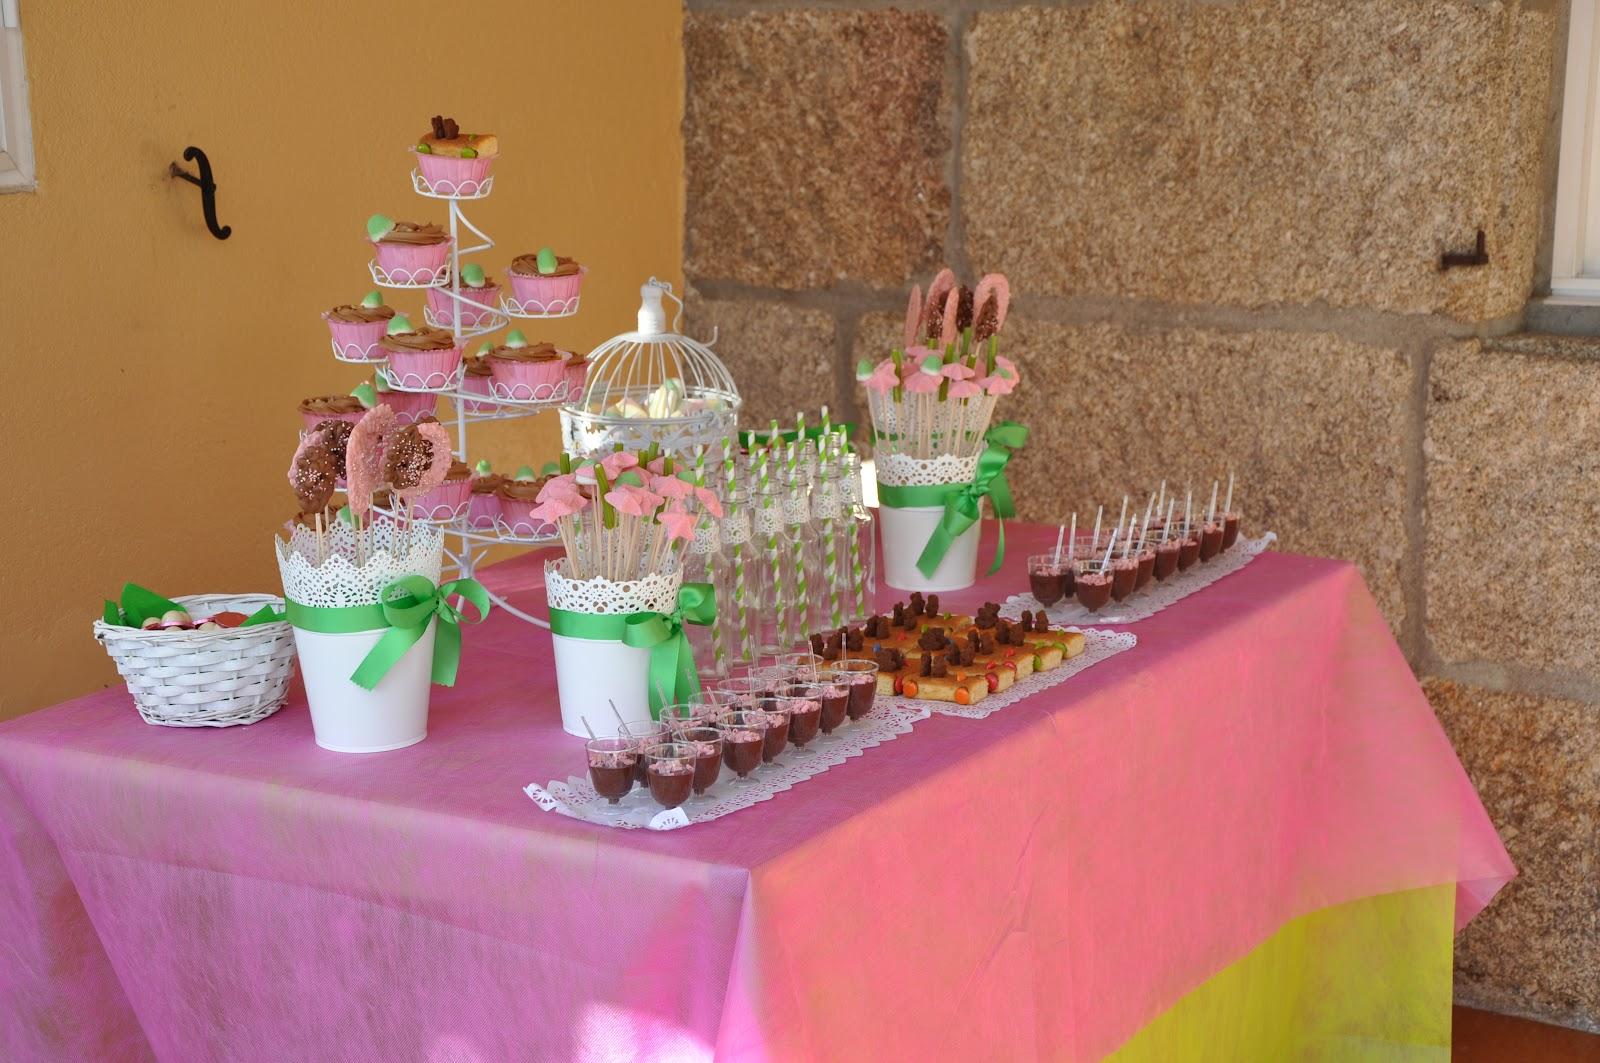 La mesa dulce del cumplea os de in s las historias de mar a for Mesas dulces cumpleanos